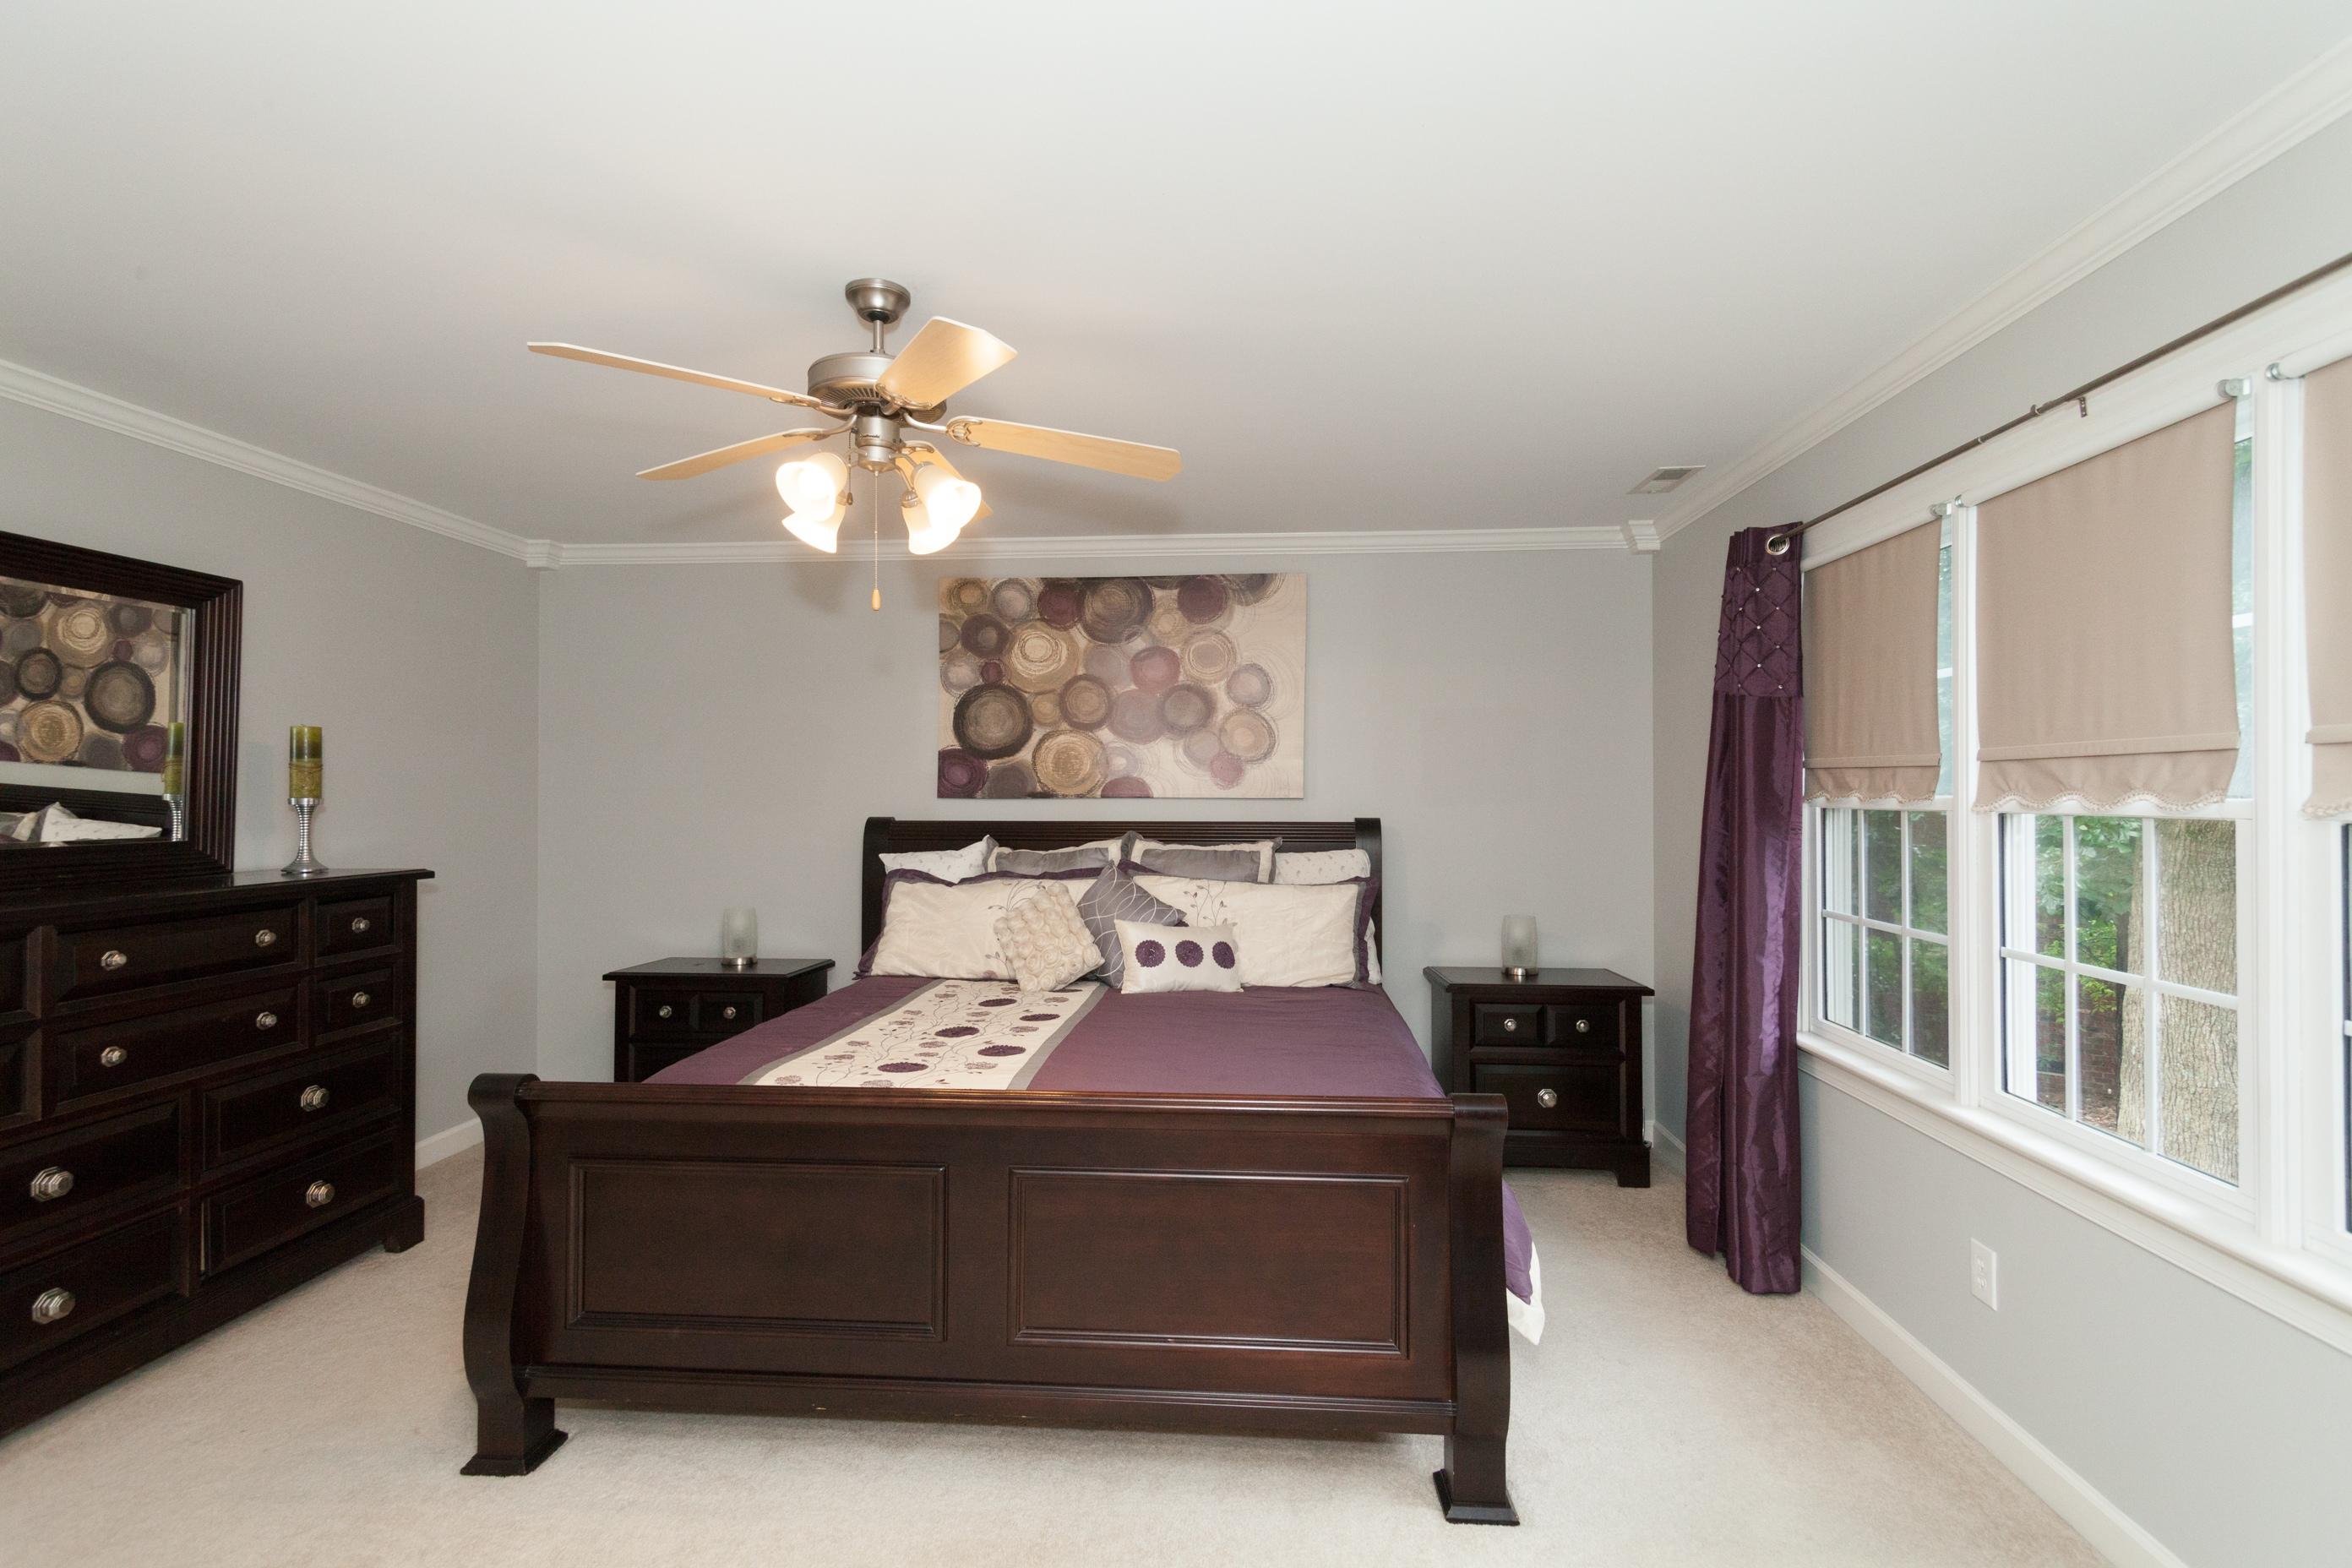 015_Master Bedroom (2)